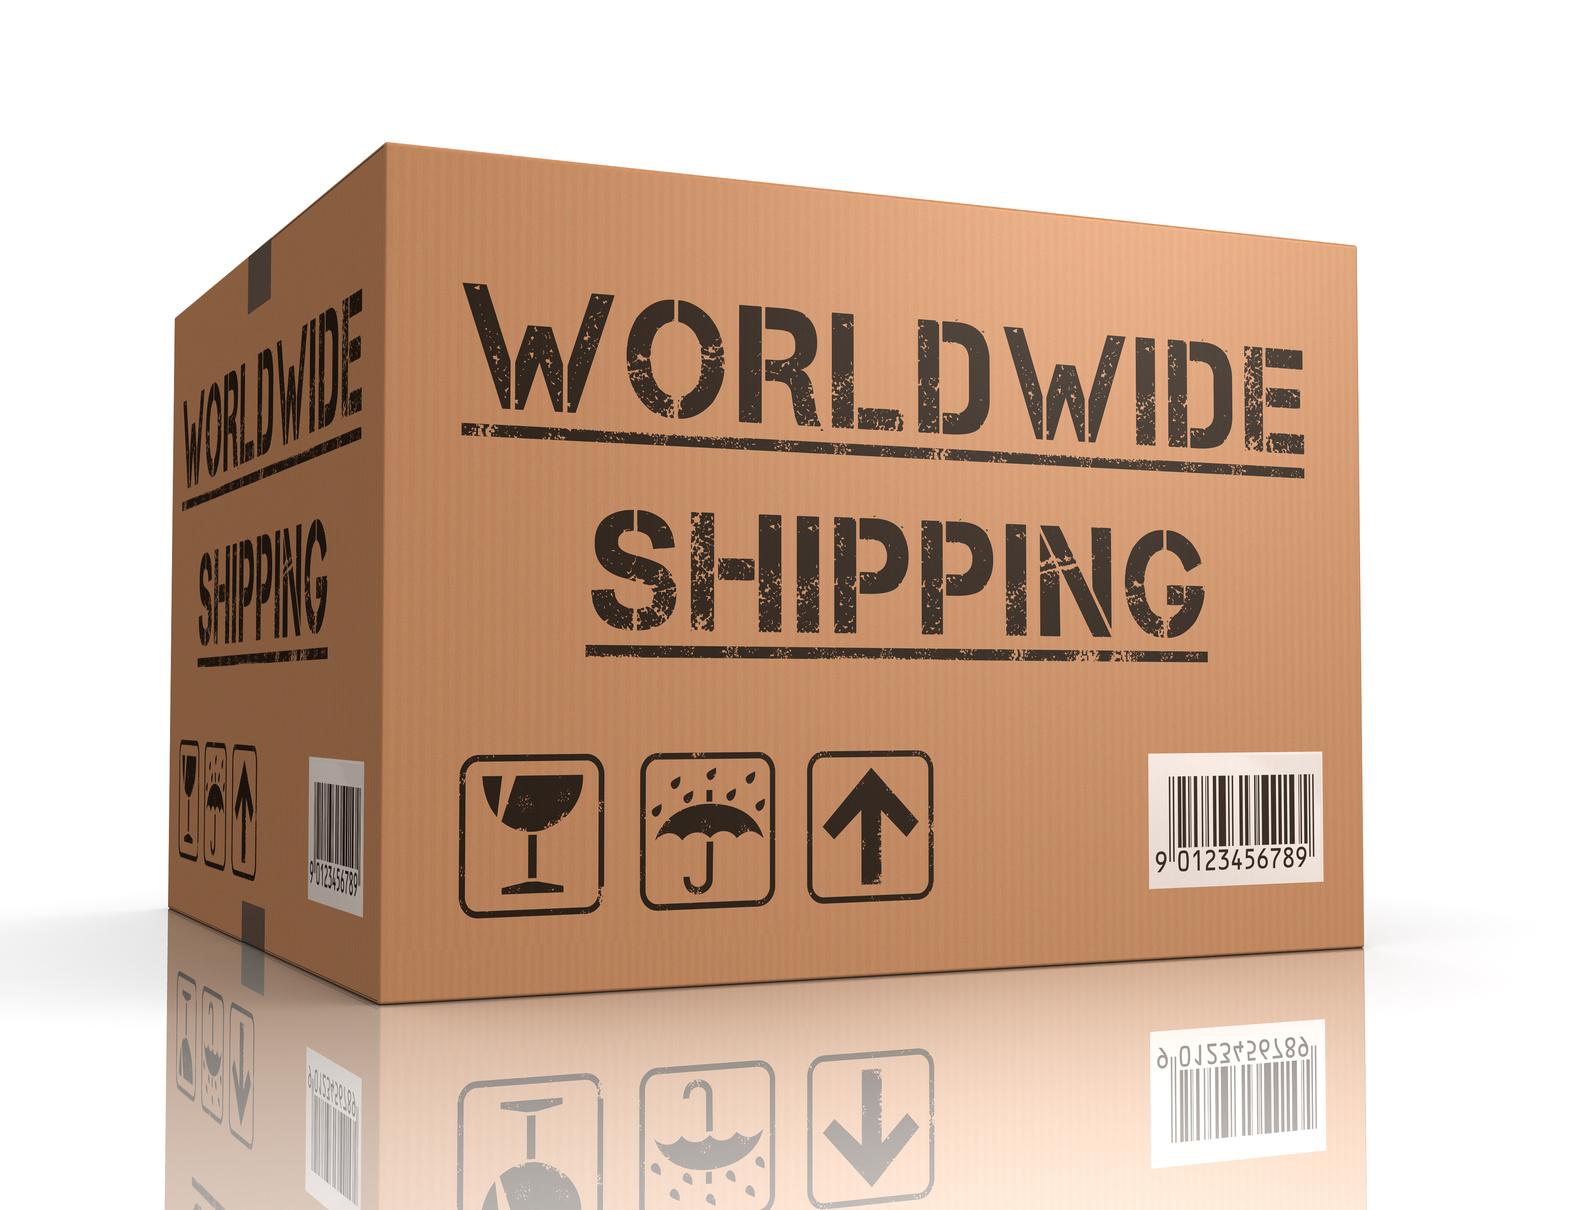 Certificats d 39 origine non pr f rentielle co ccibw - Certificat d origine chambre de commerce ...